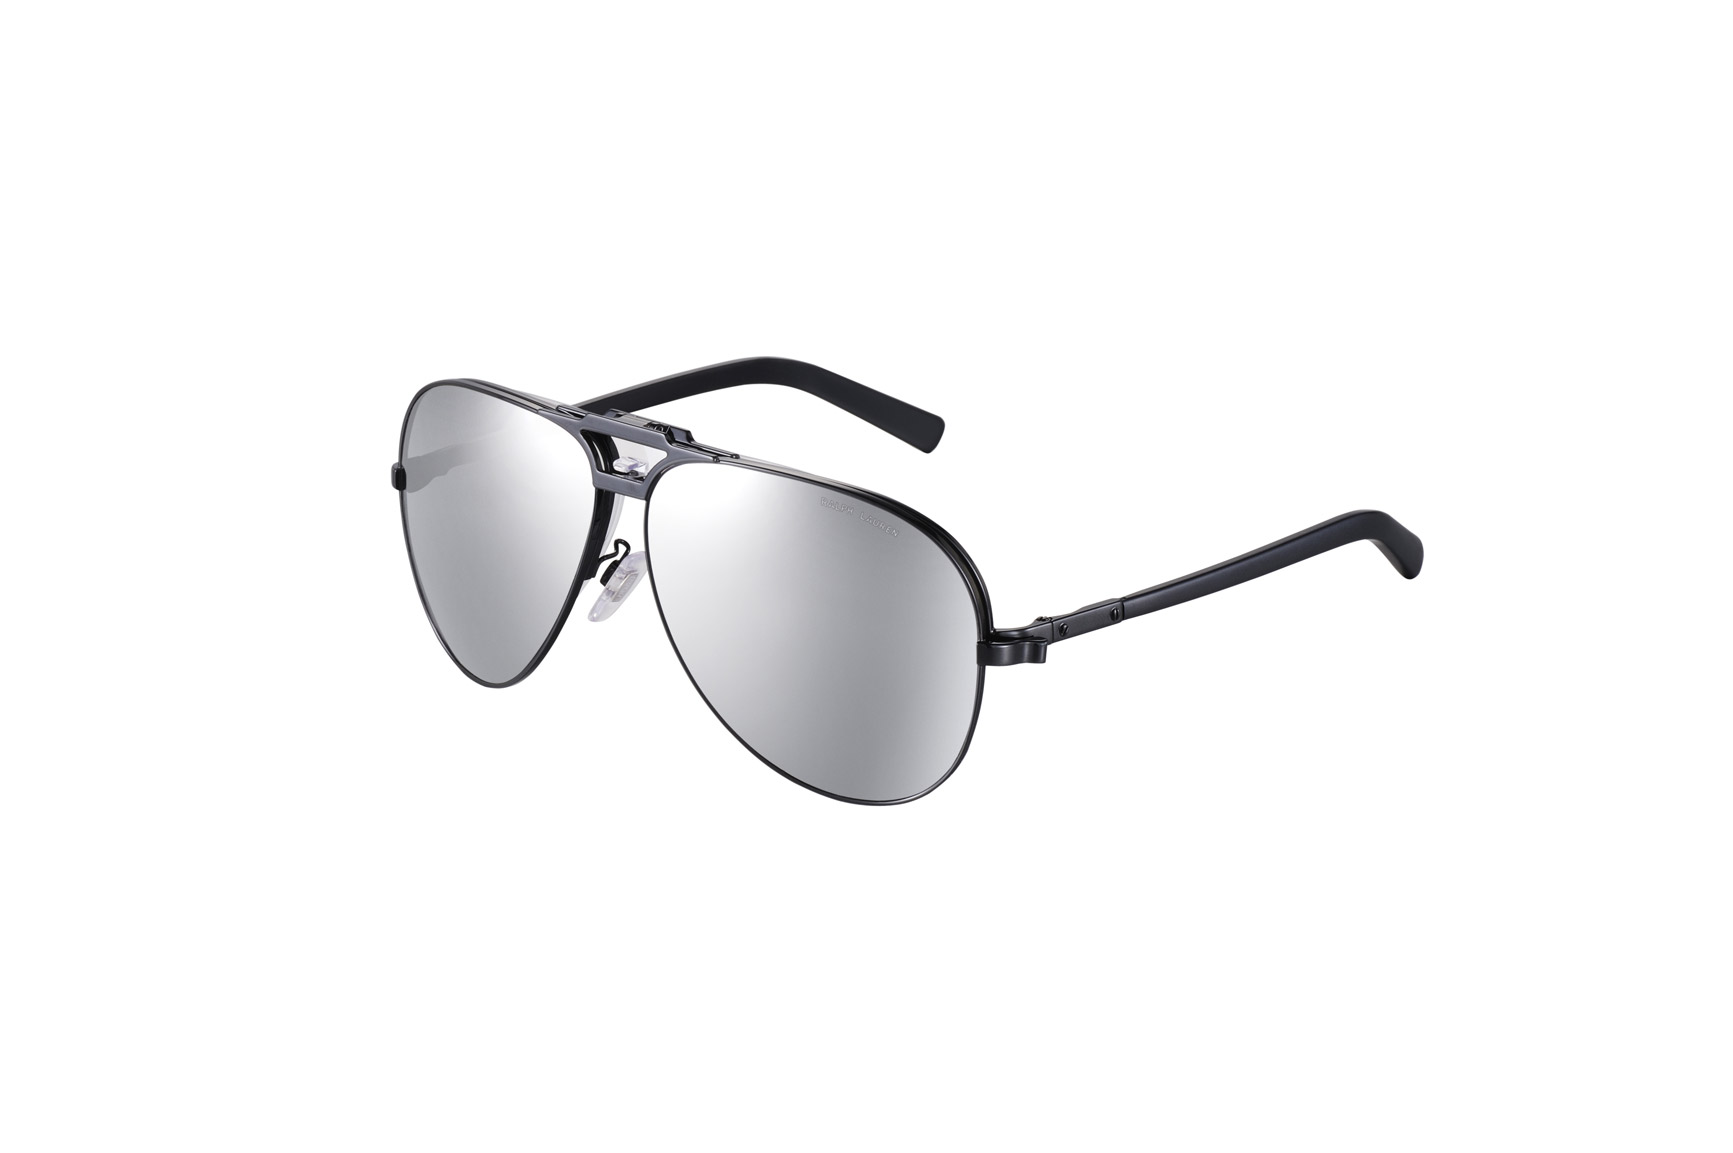 Coach Eyeglass Frames Pearle Vision : Ralph Lauren Eyeglasses Pearle Vision